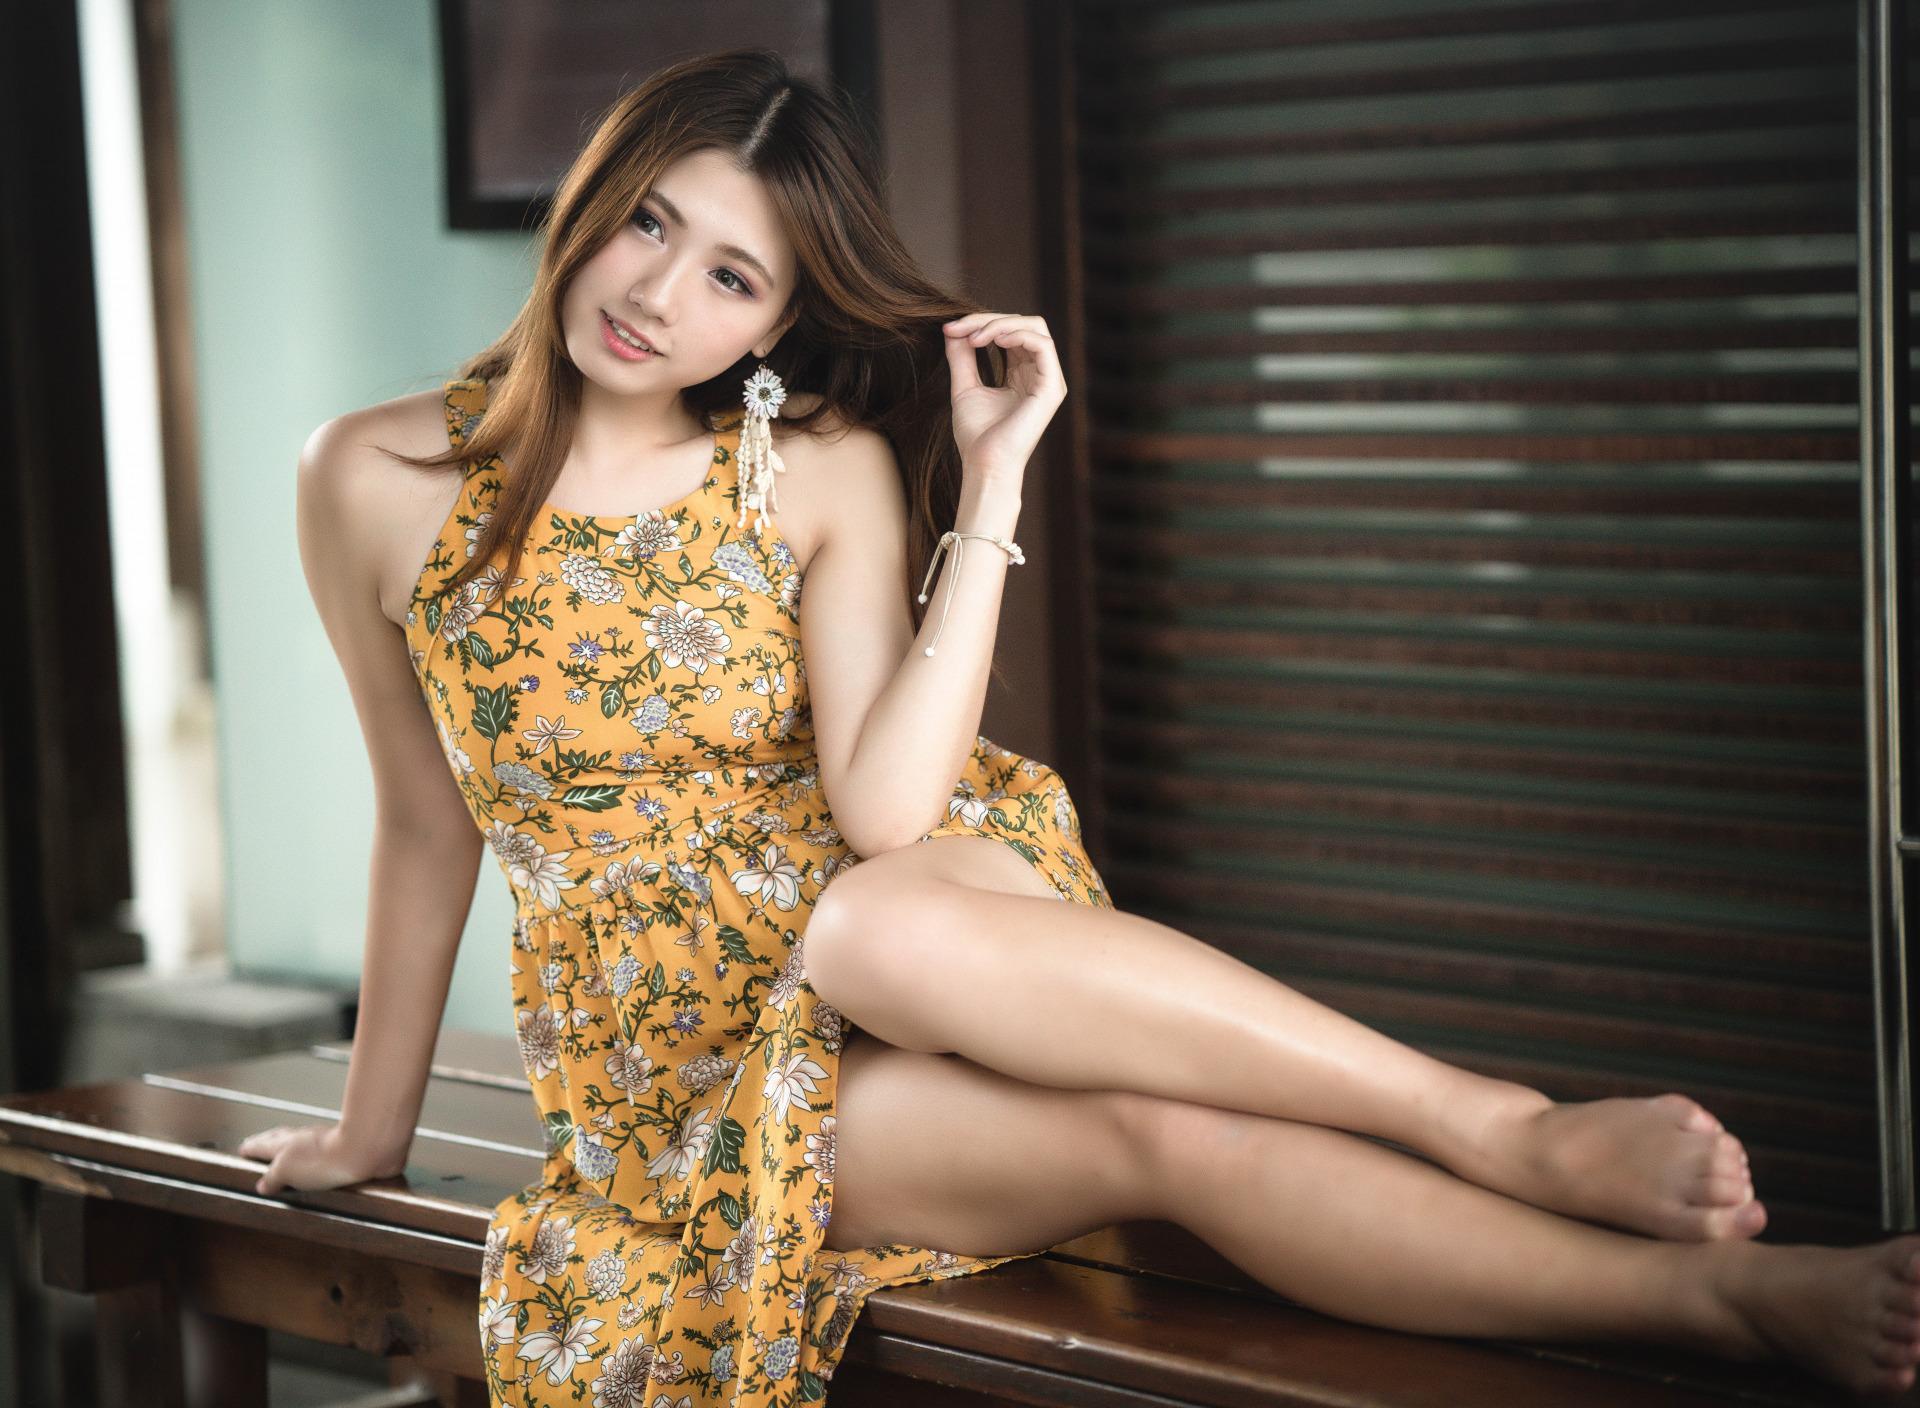 Teen Oriental